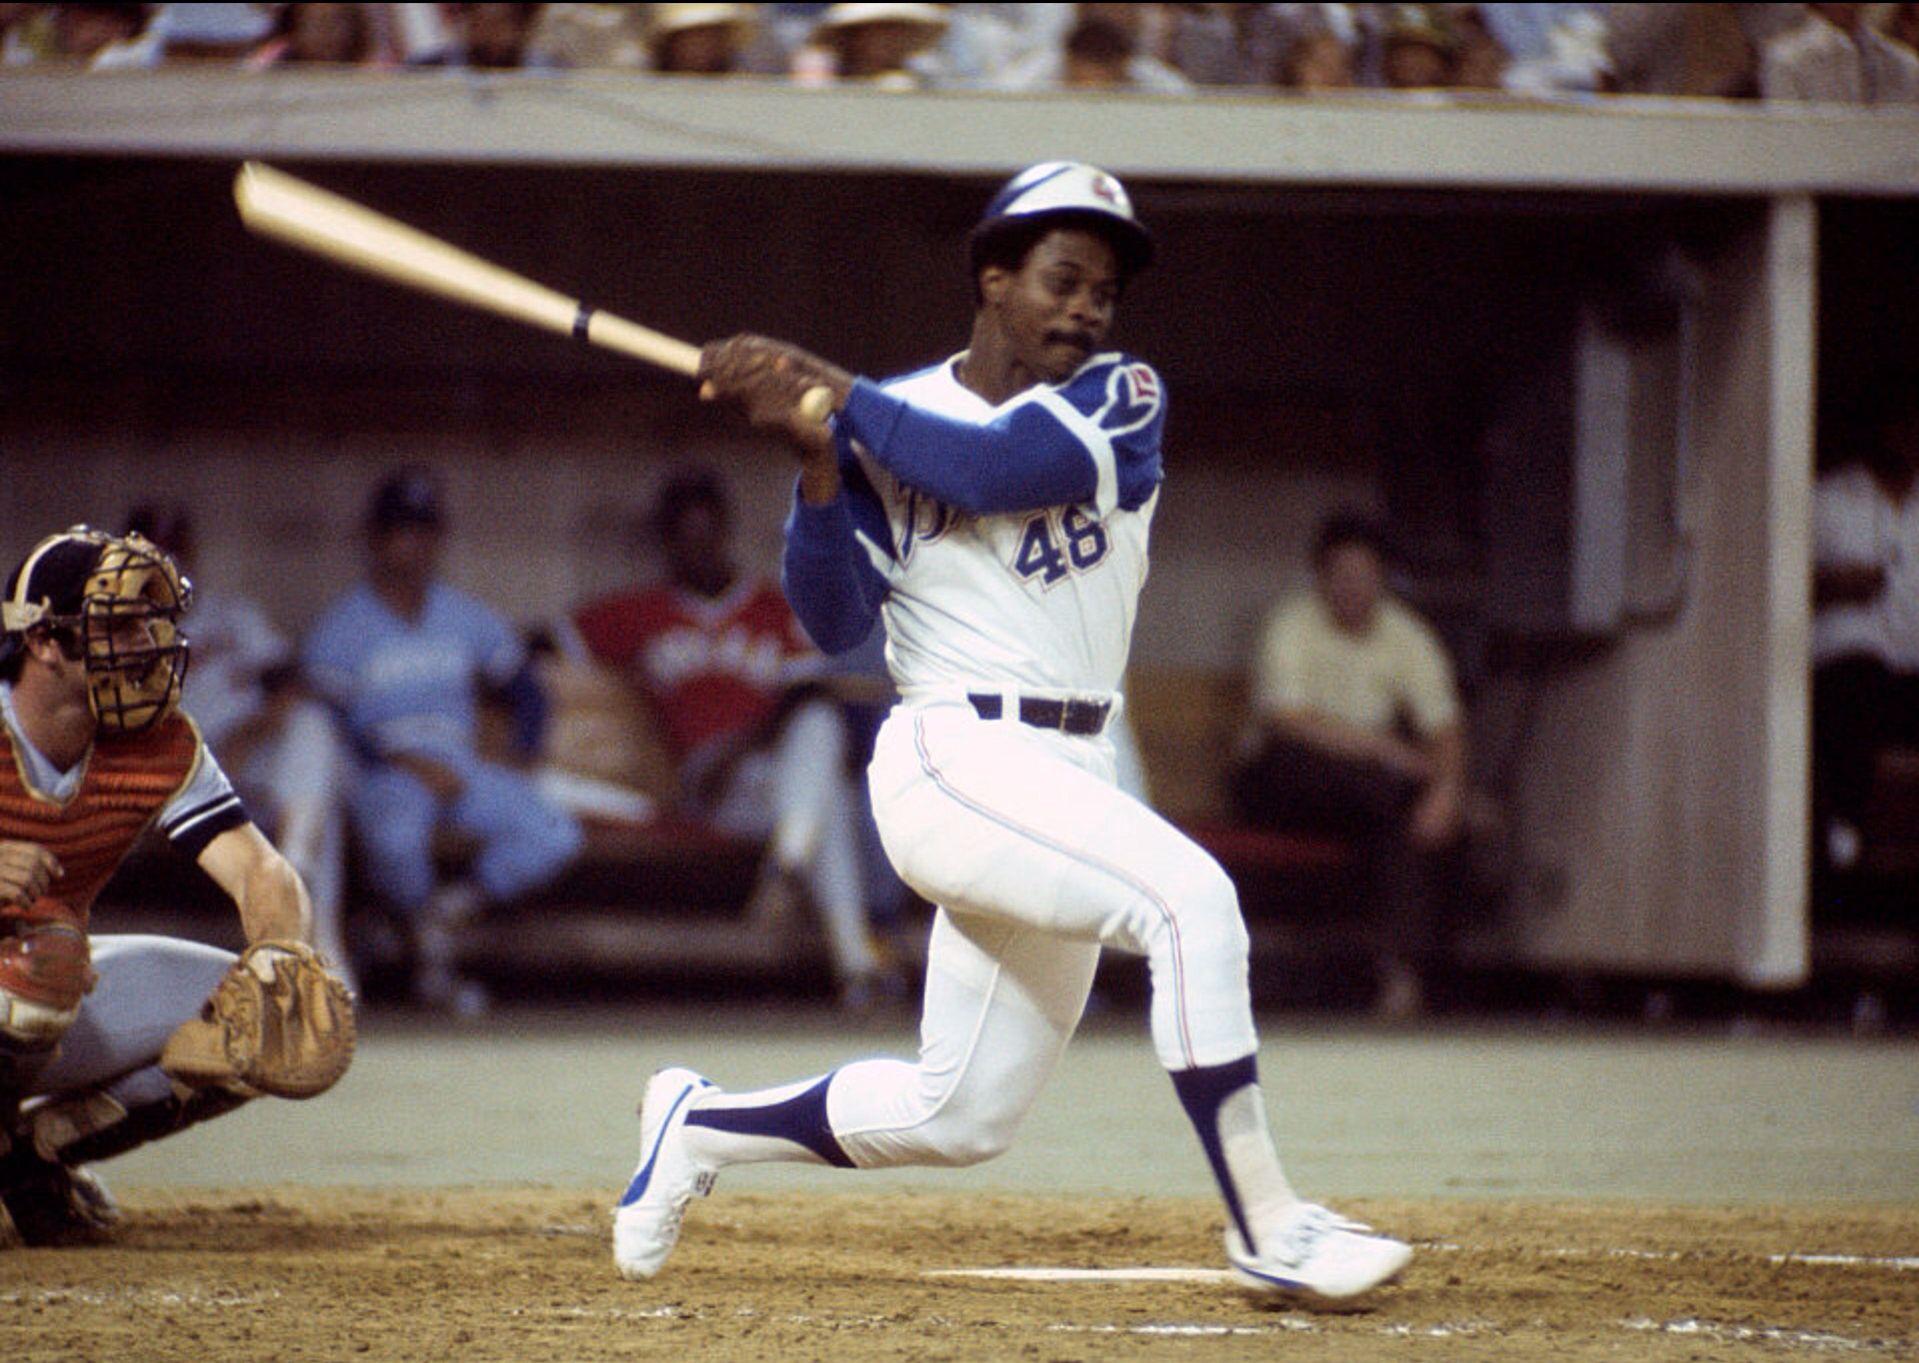 Ralph Garr Atlanta Braves 1974 All Star Game Atlanta Braves Braves Braves Baseball